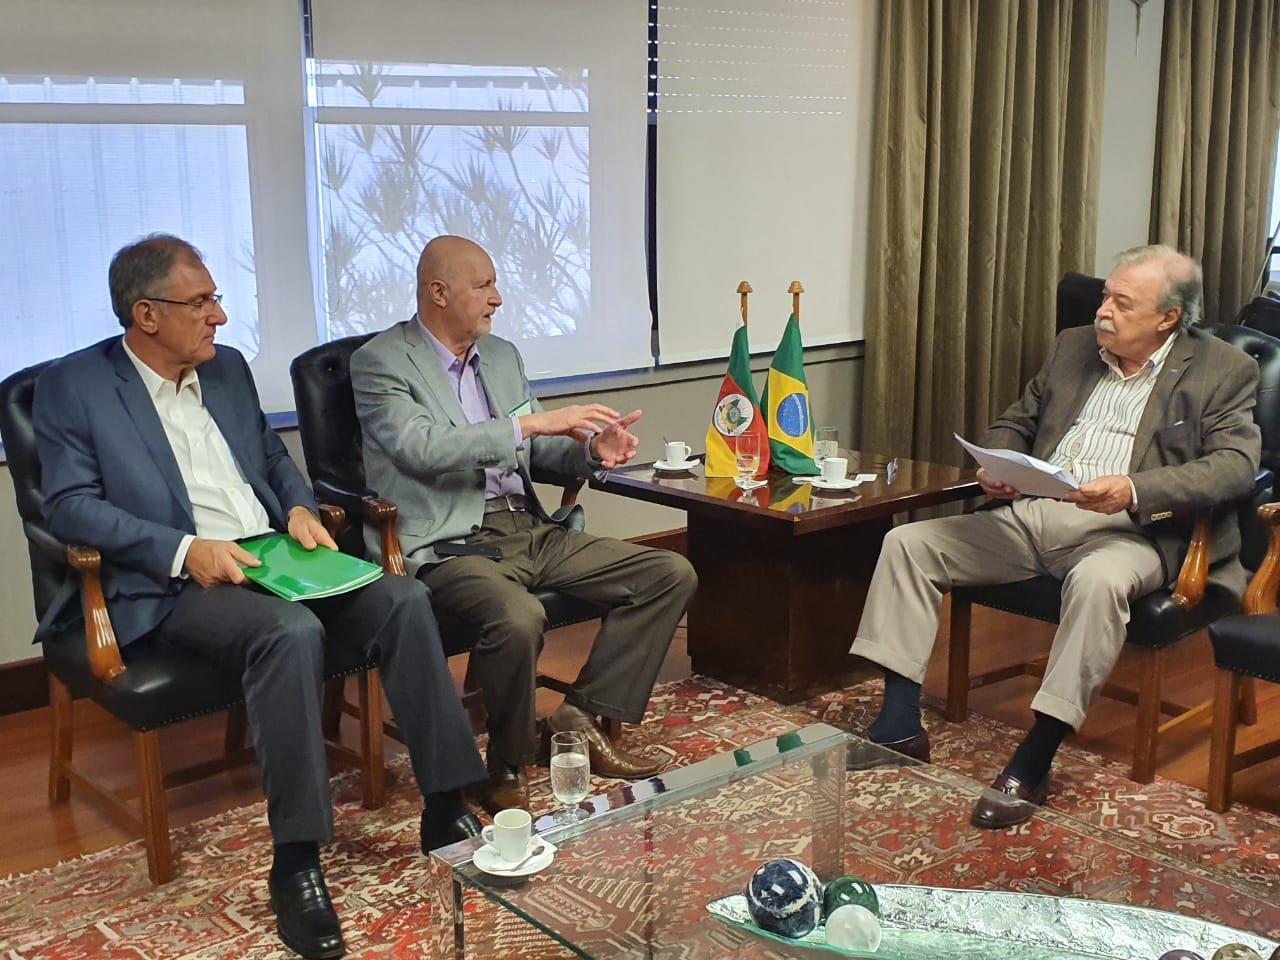 Presidente da John Deere visita a FIERGS